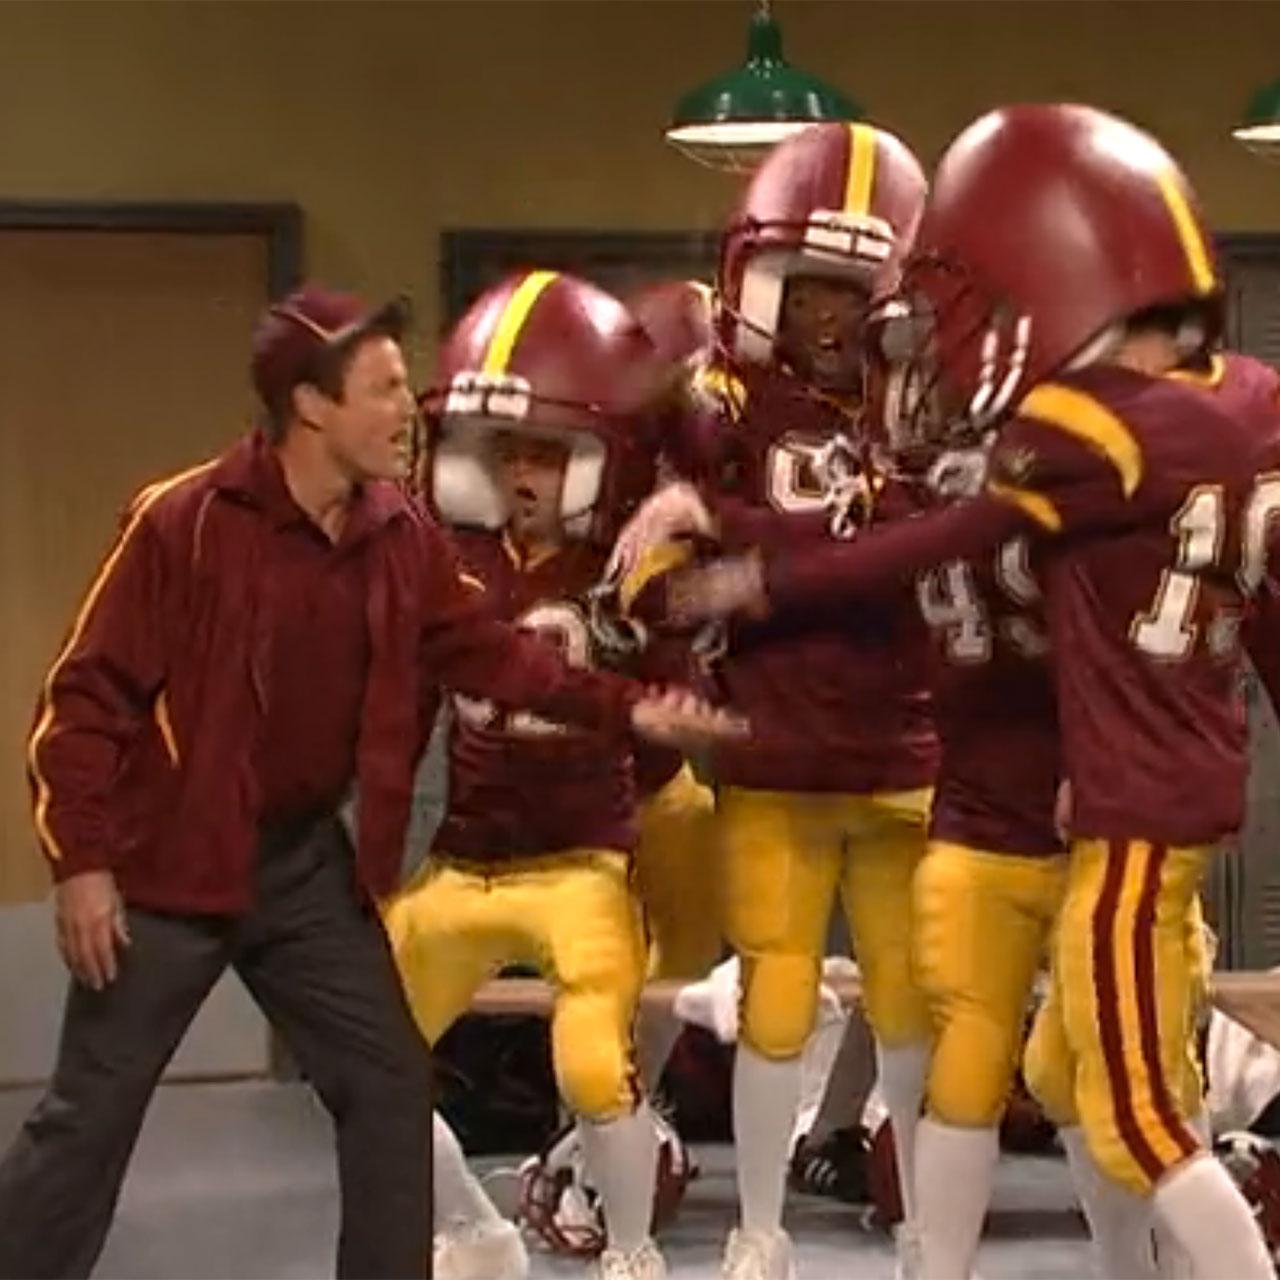 Woody Harrelson appears as a high school football coach on SNL